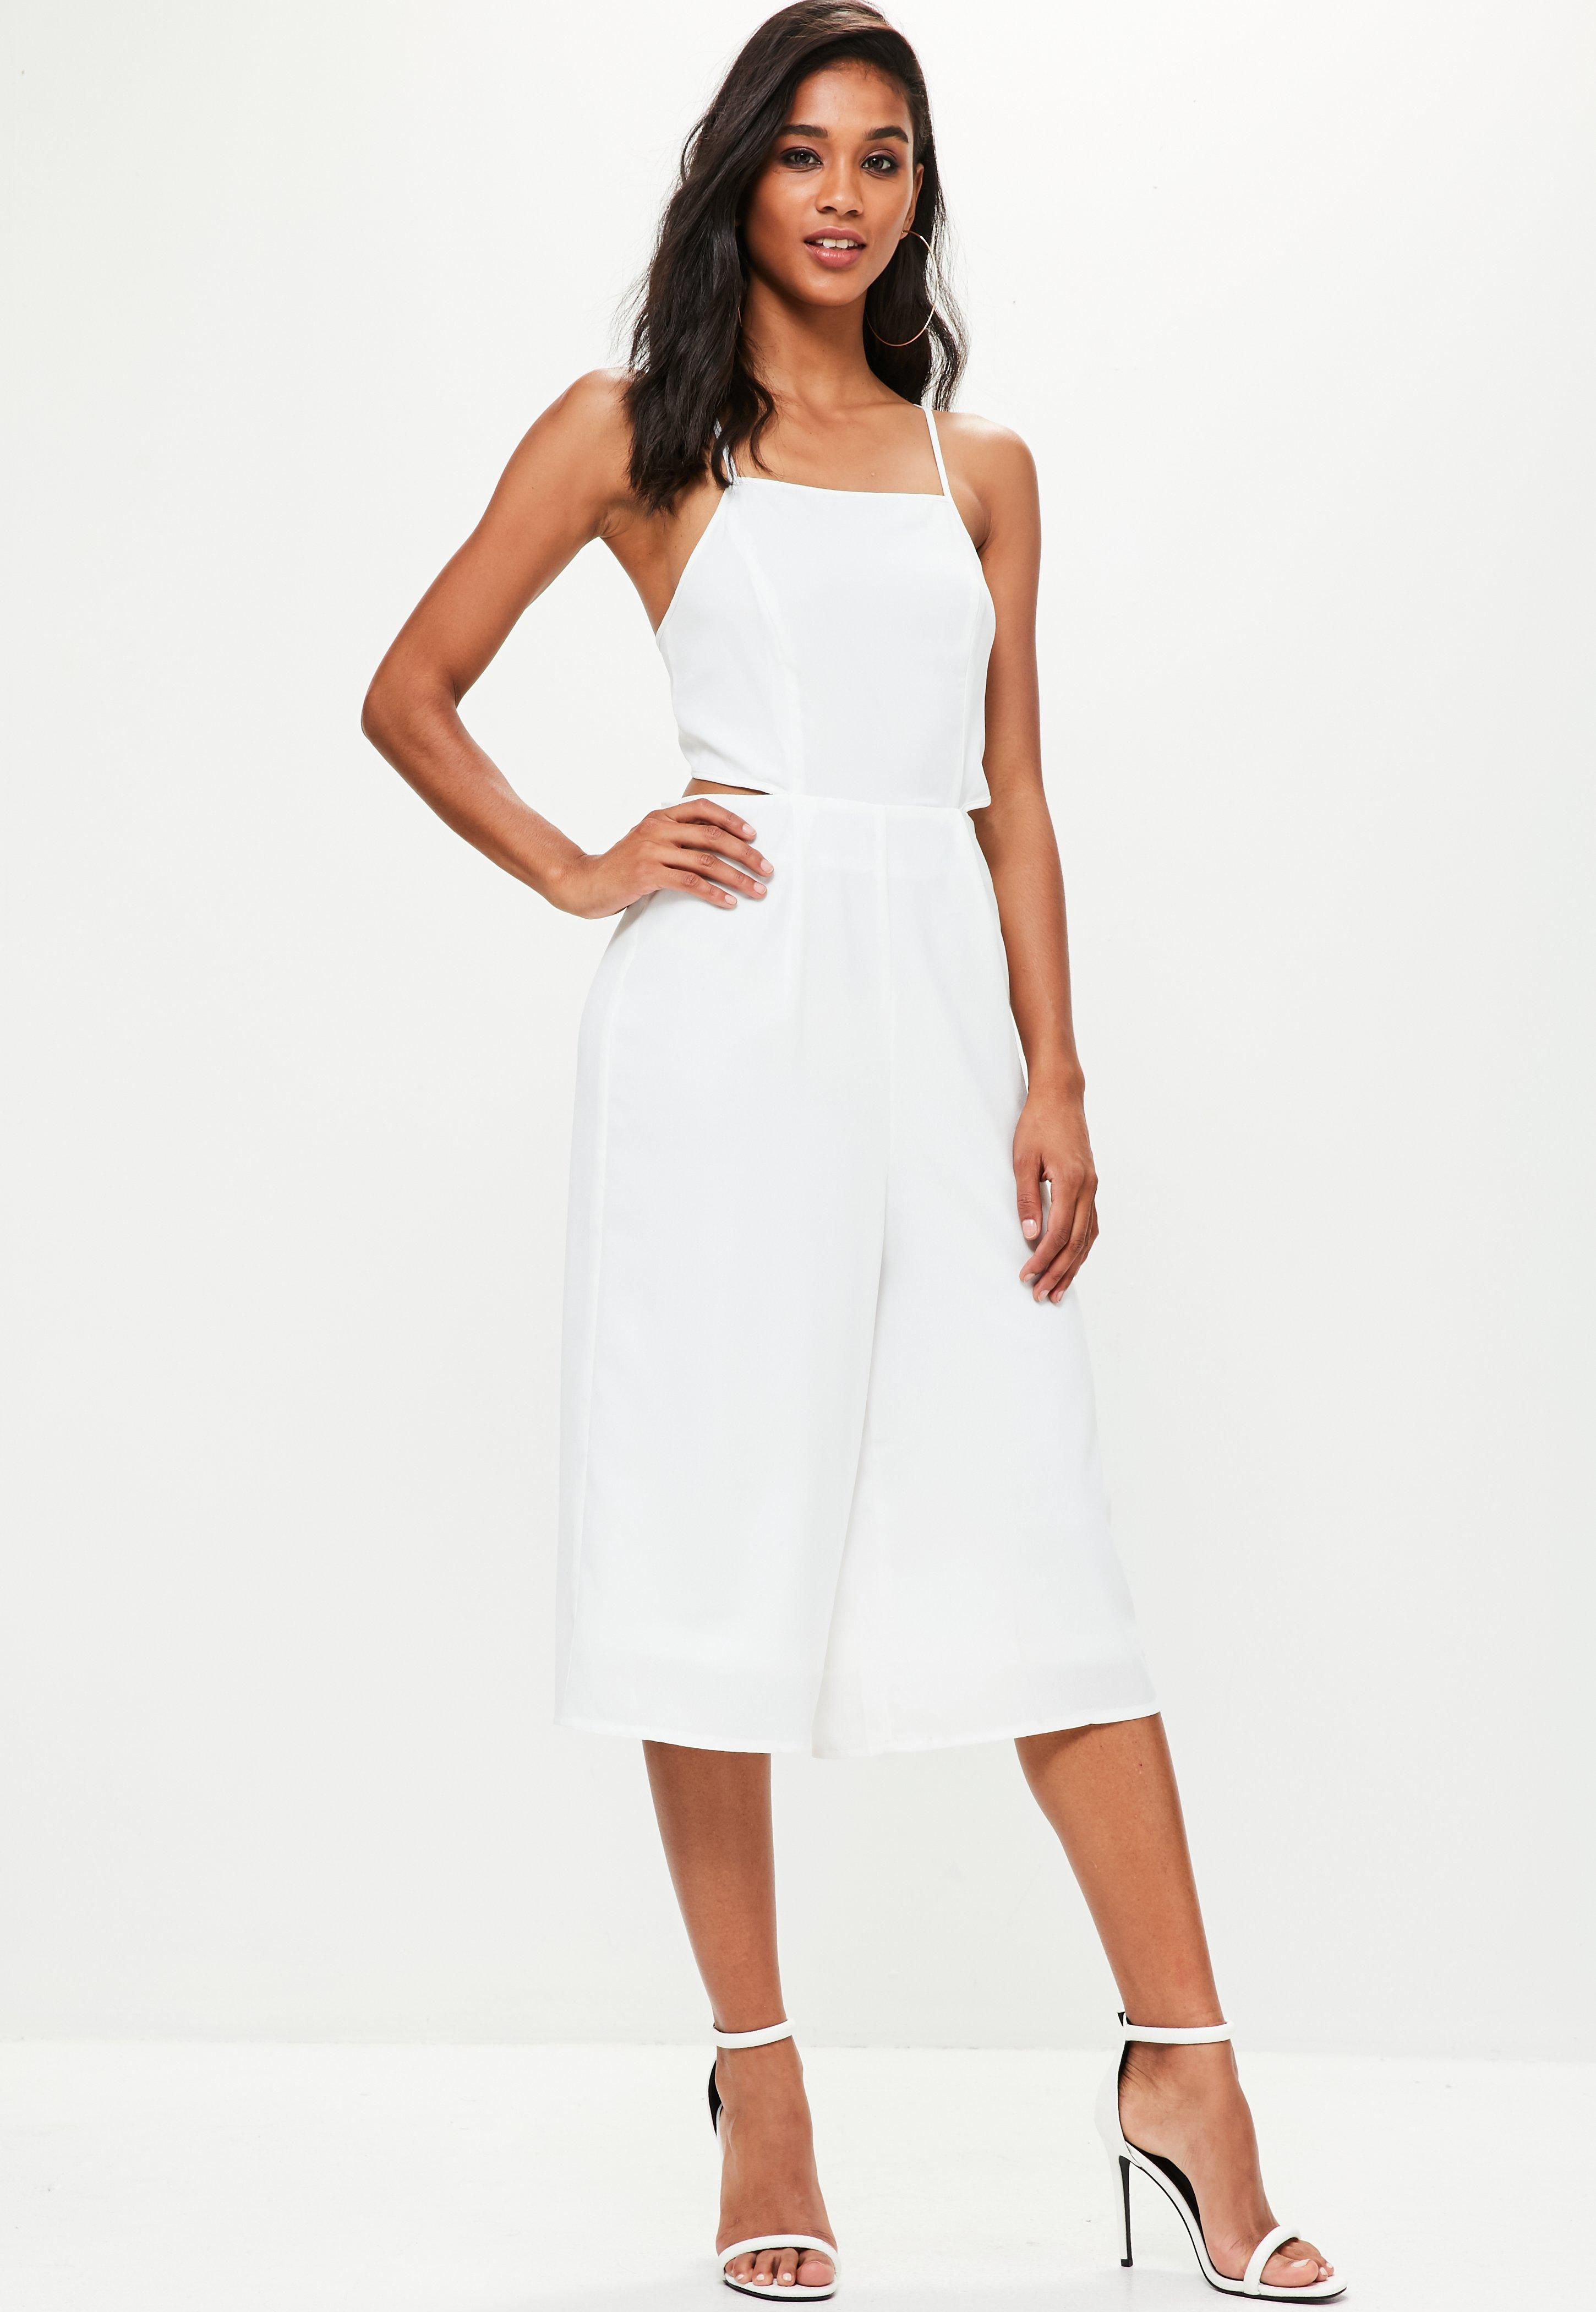 Magasin robe de cocktail evreux